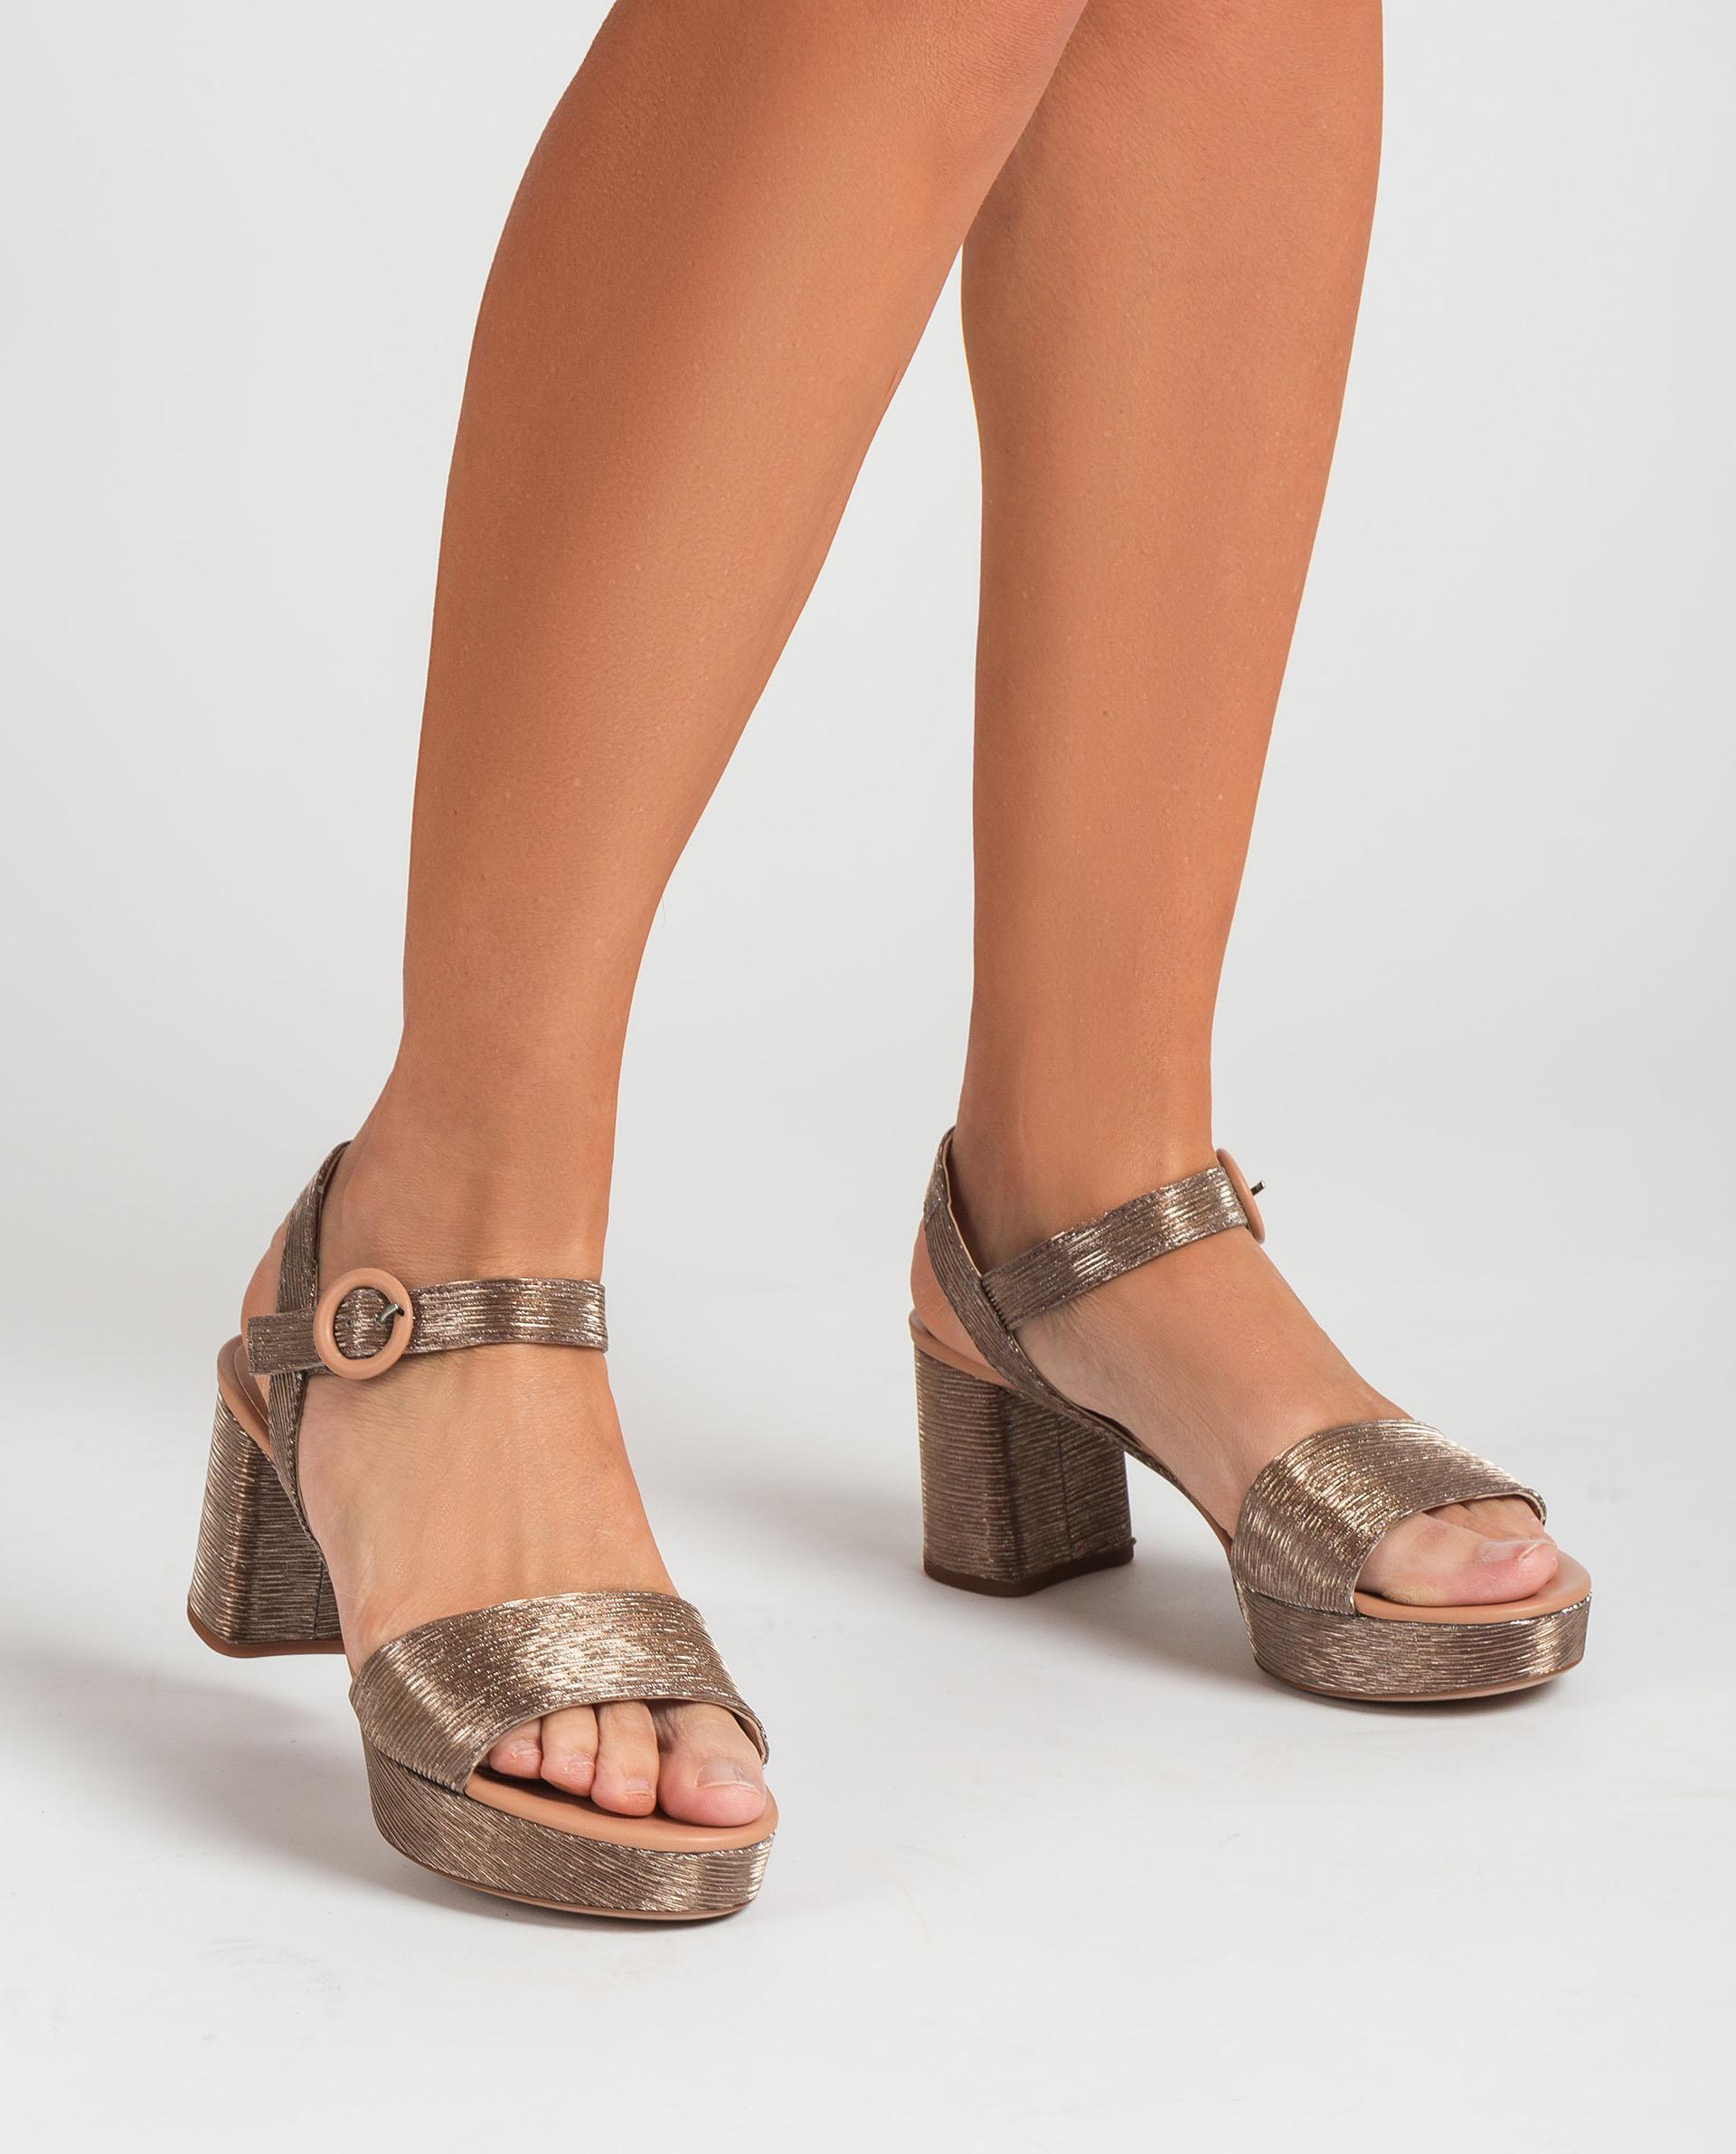 UNISA Shiny effect fabric sandals NENES_21_RAD_NA 2